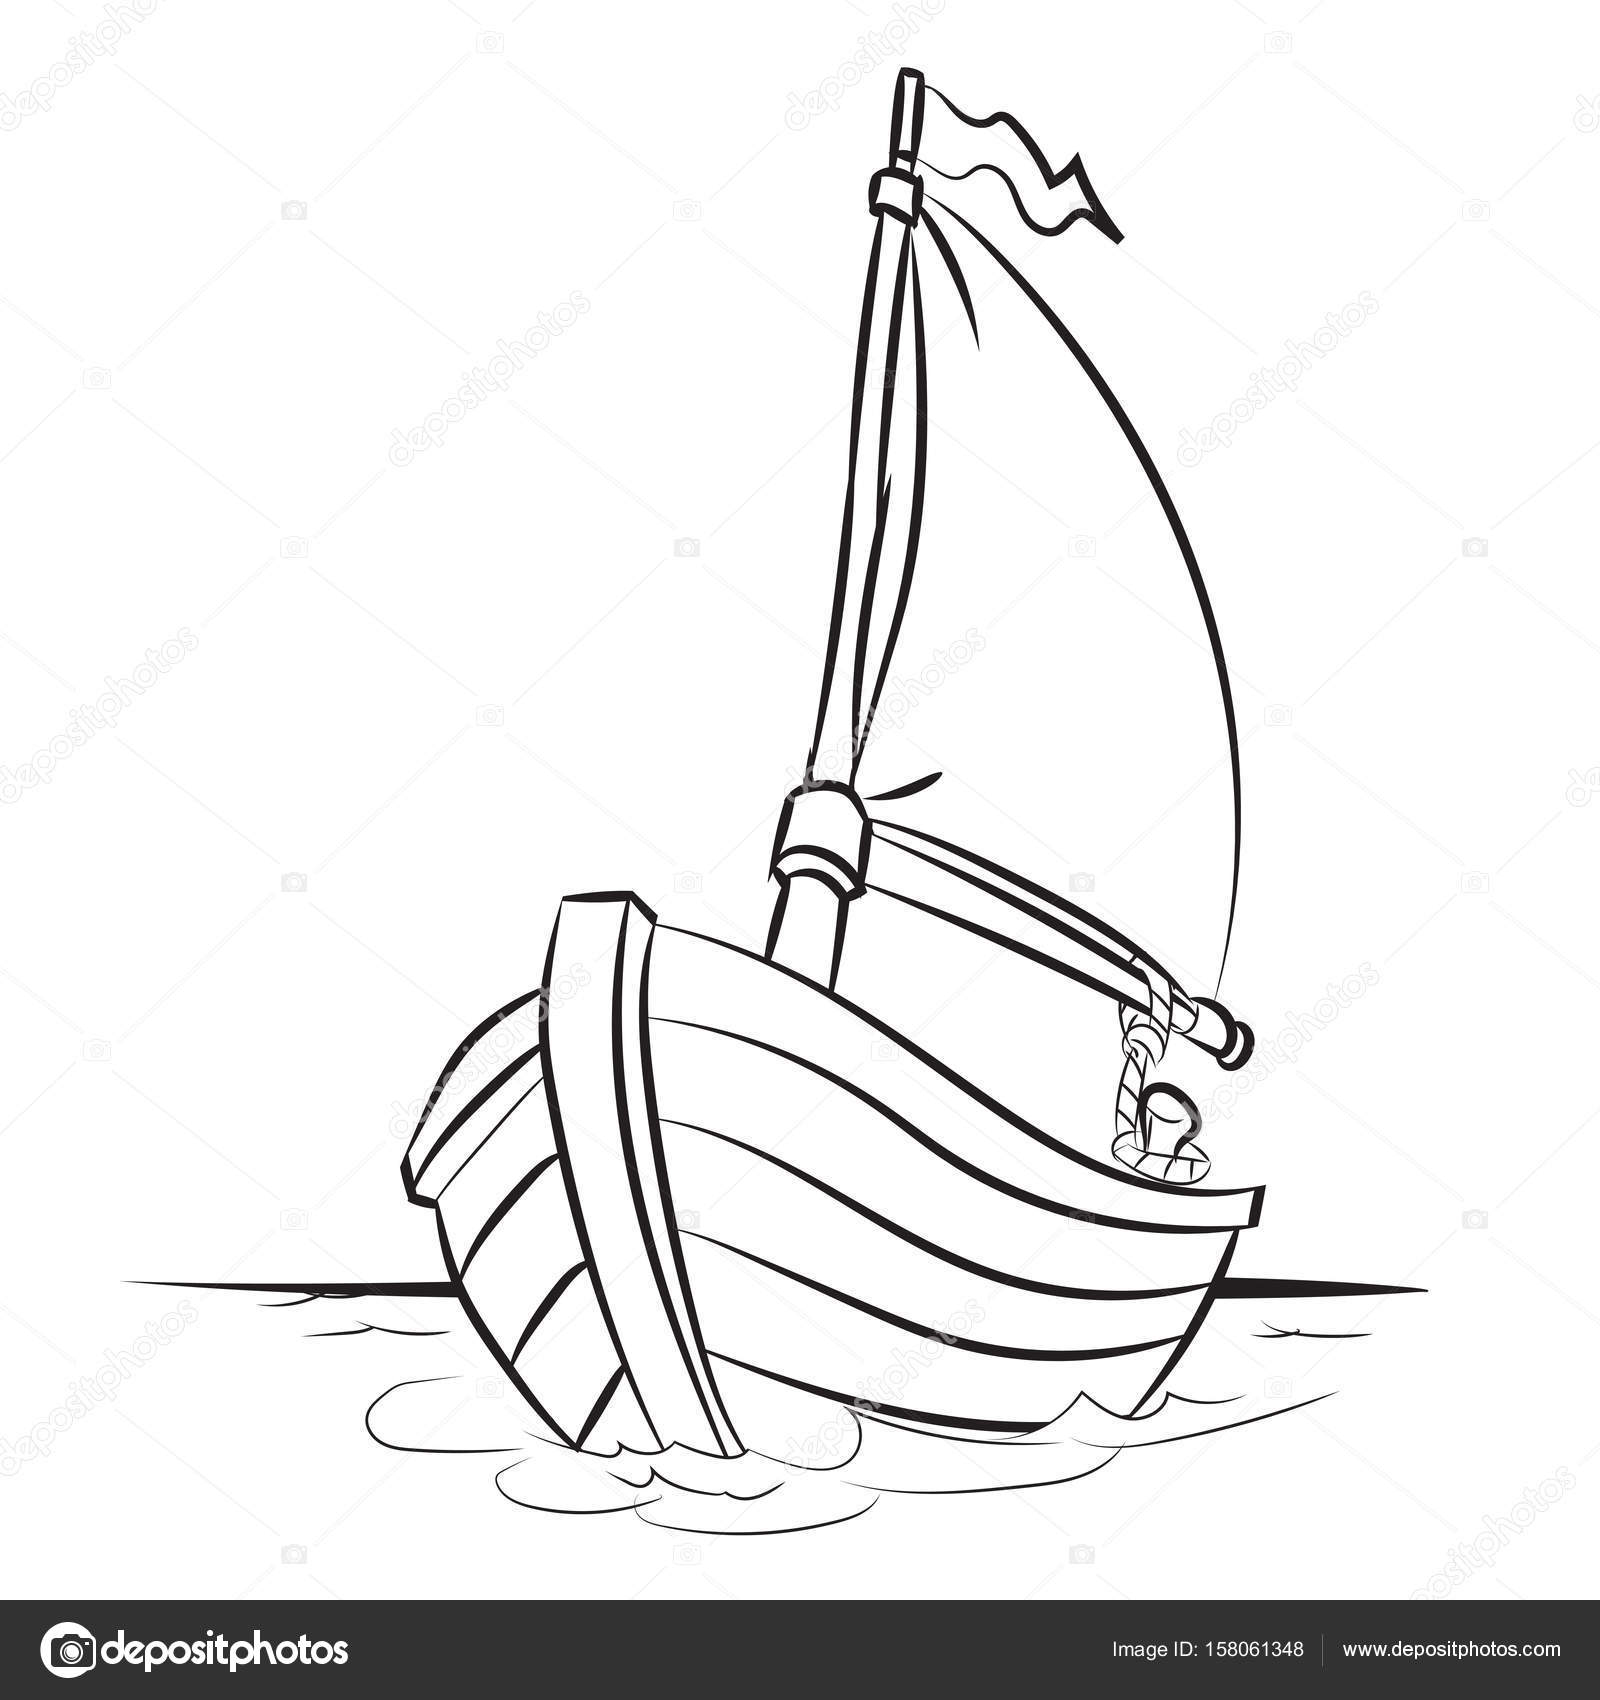 Cartoon Boat Drawing At Getdrawings